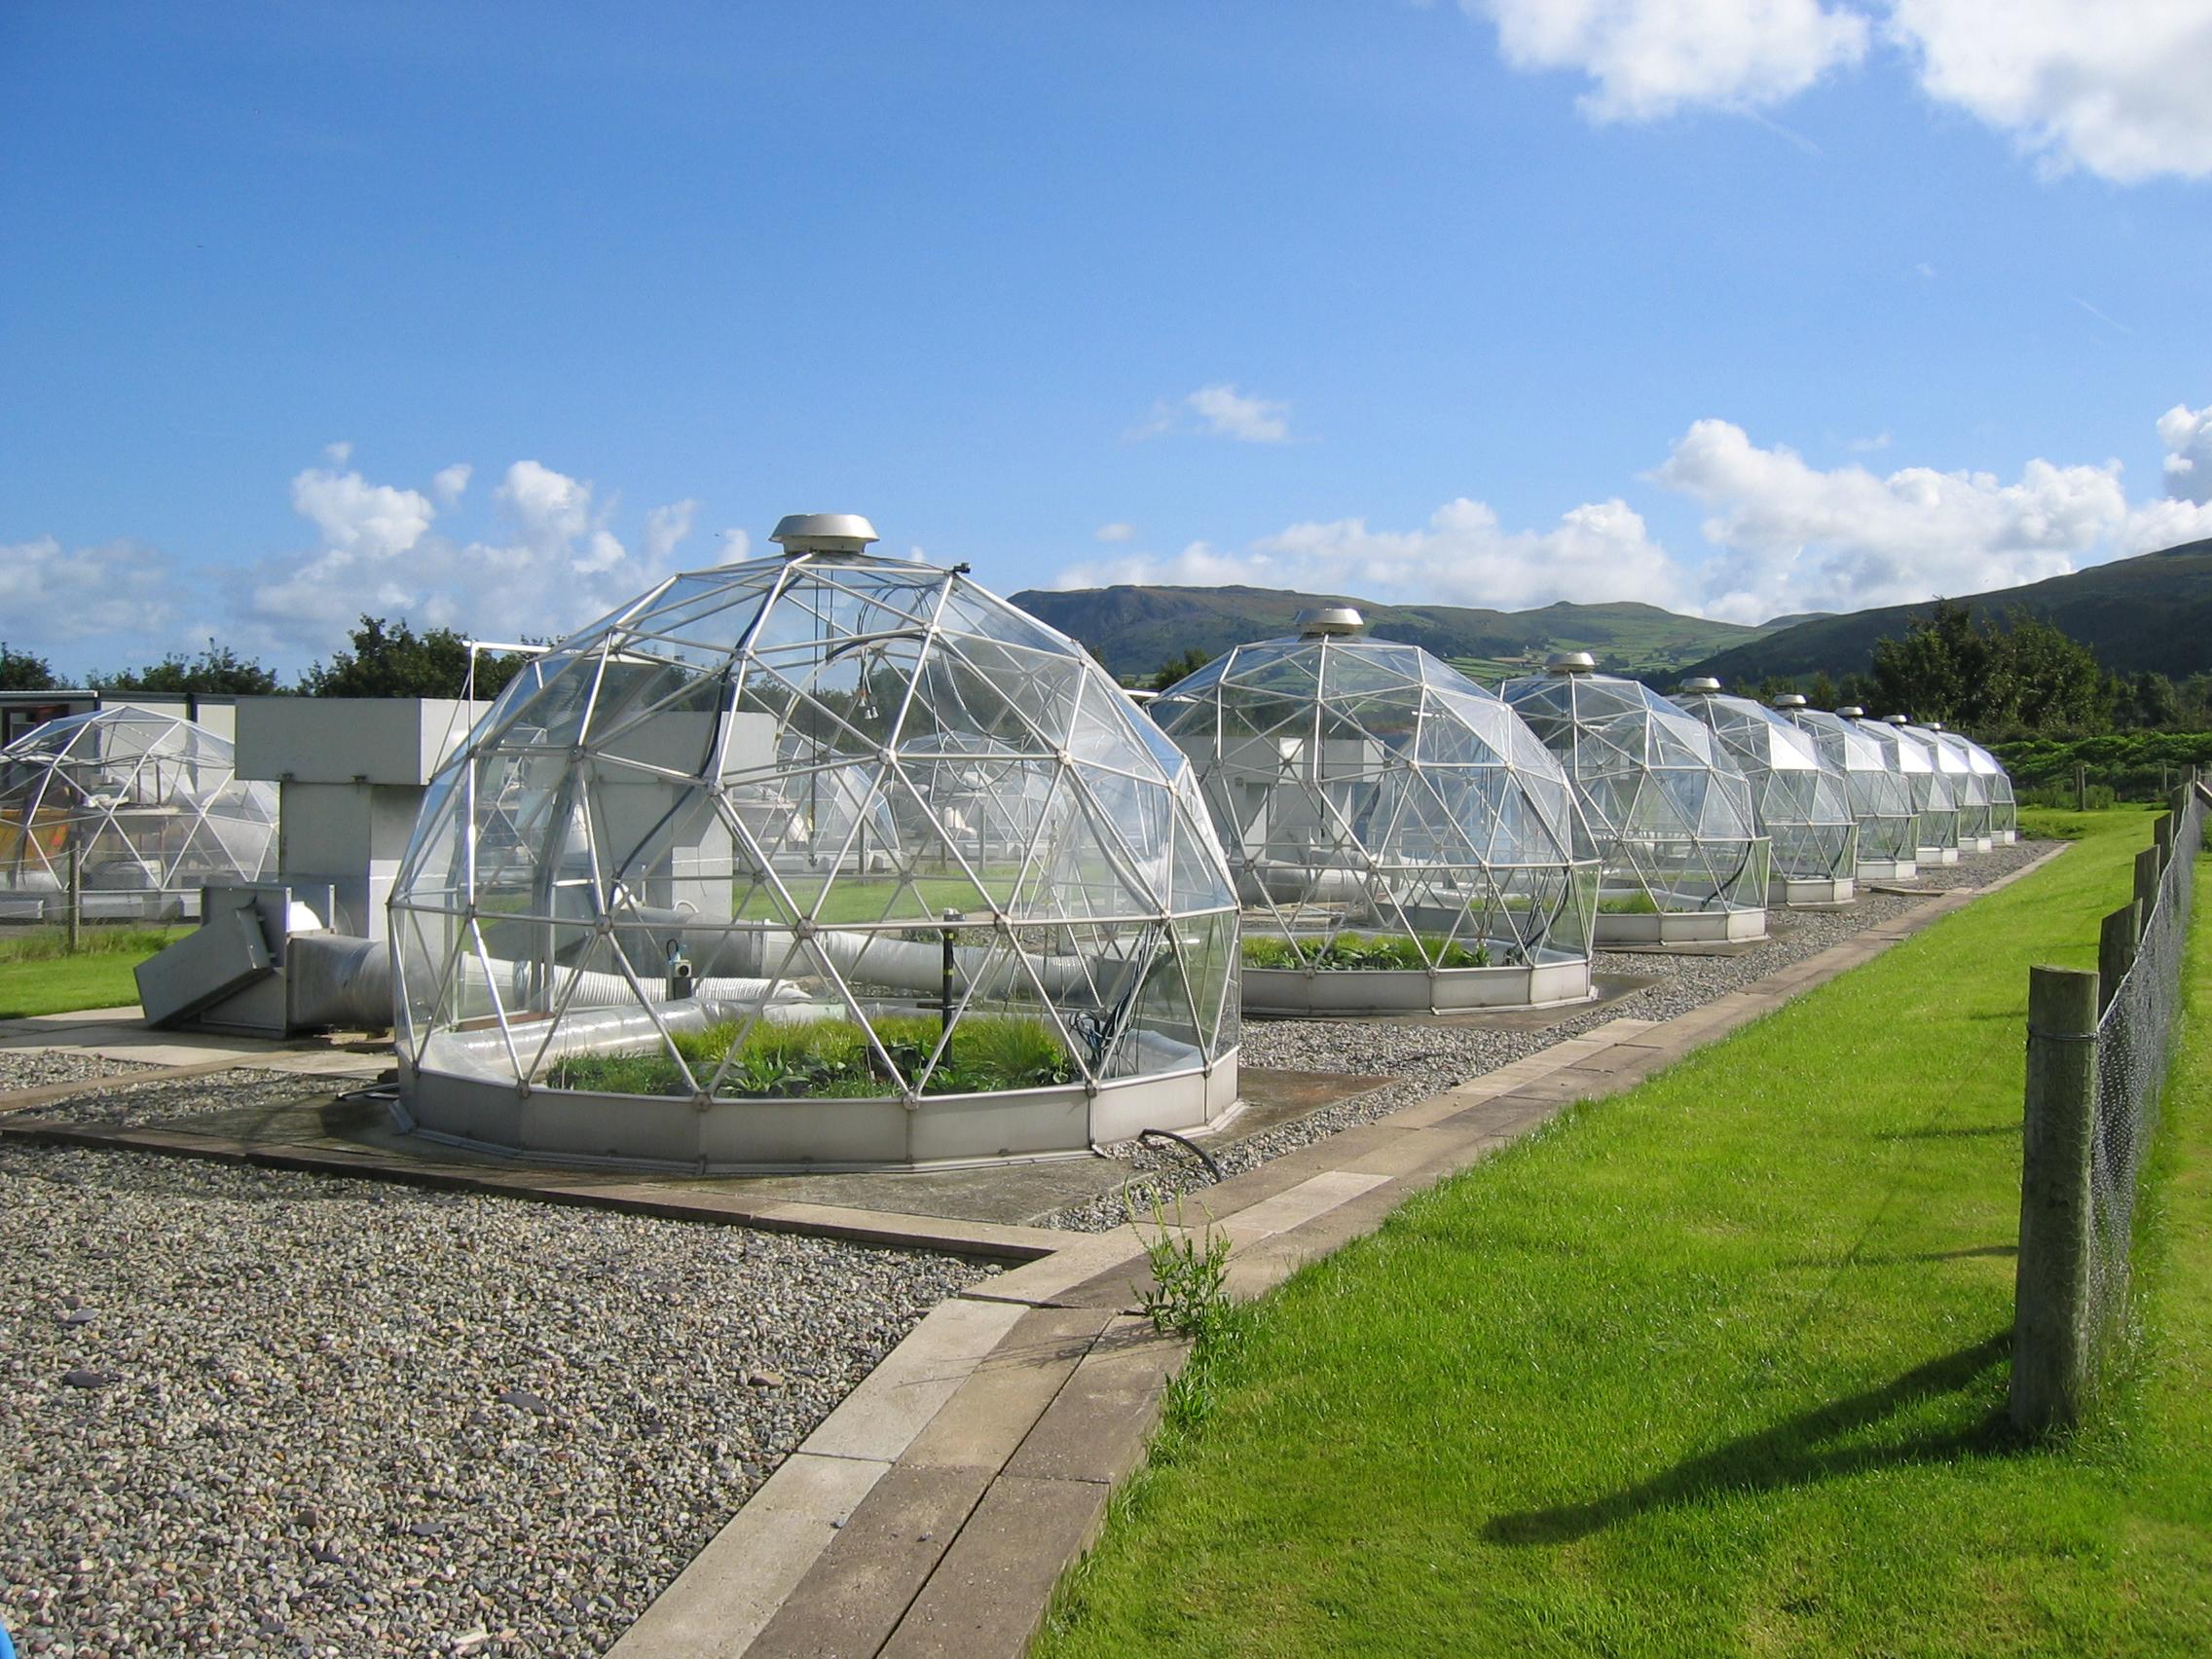 Solardome facility at CEH's Bangor site